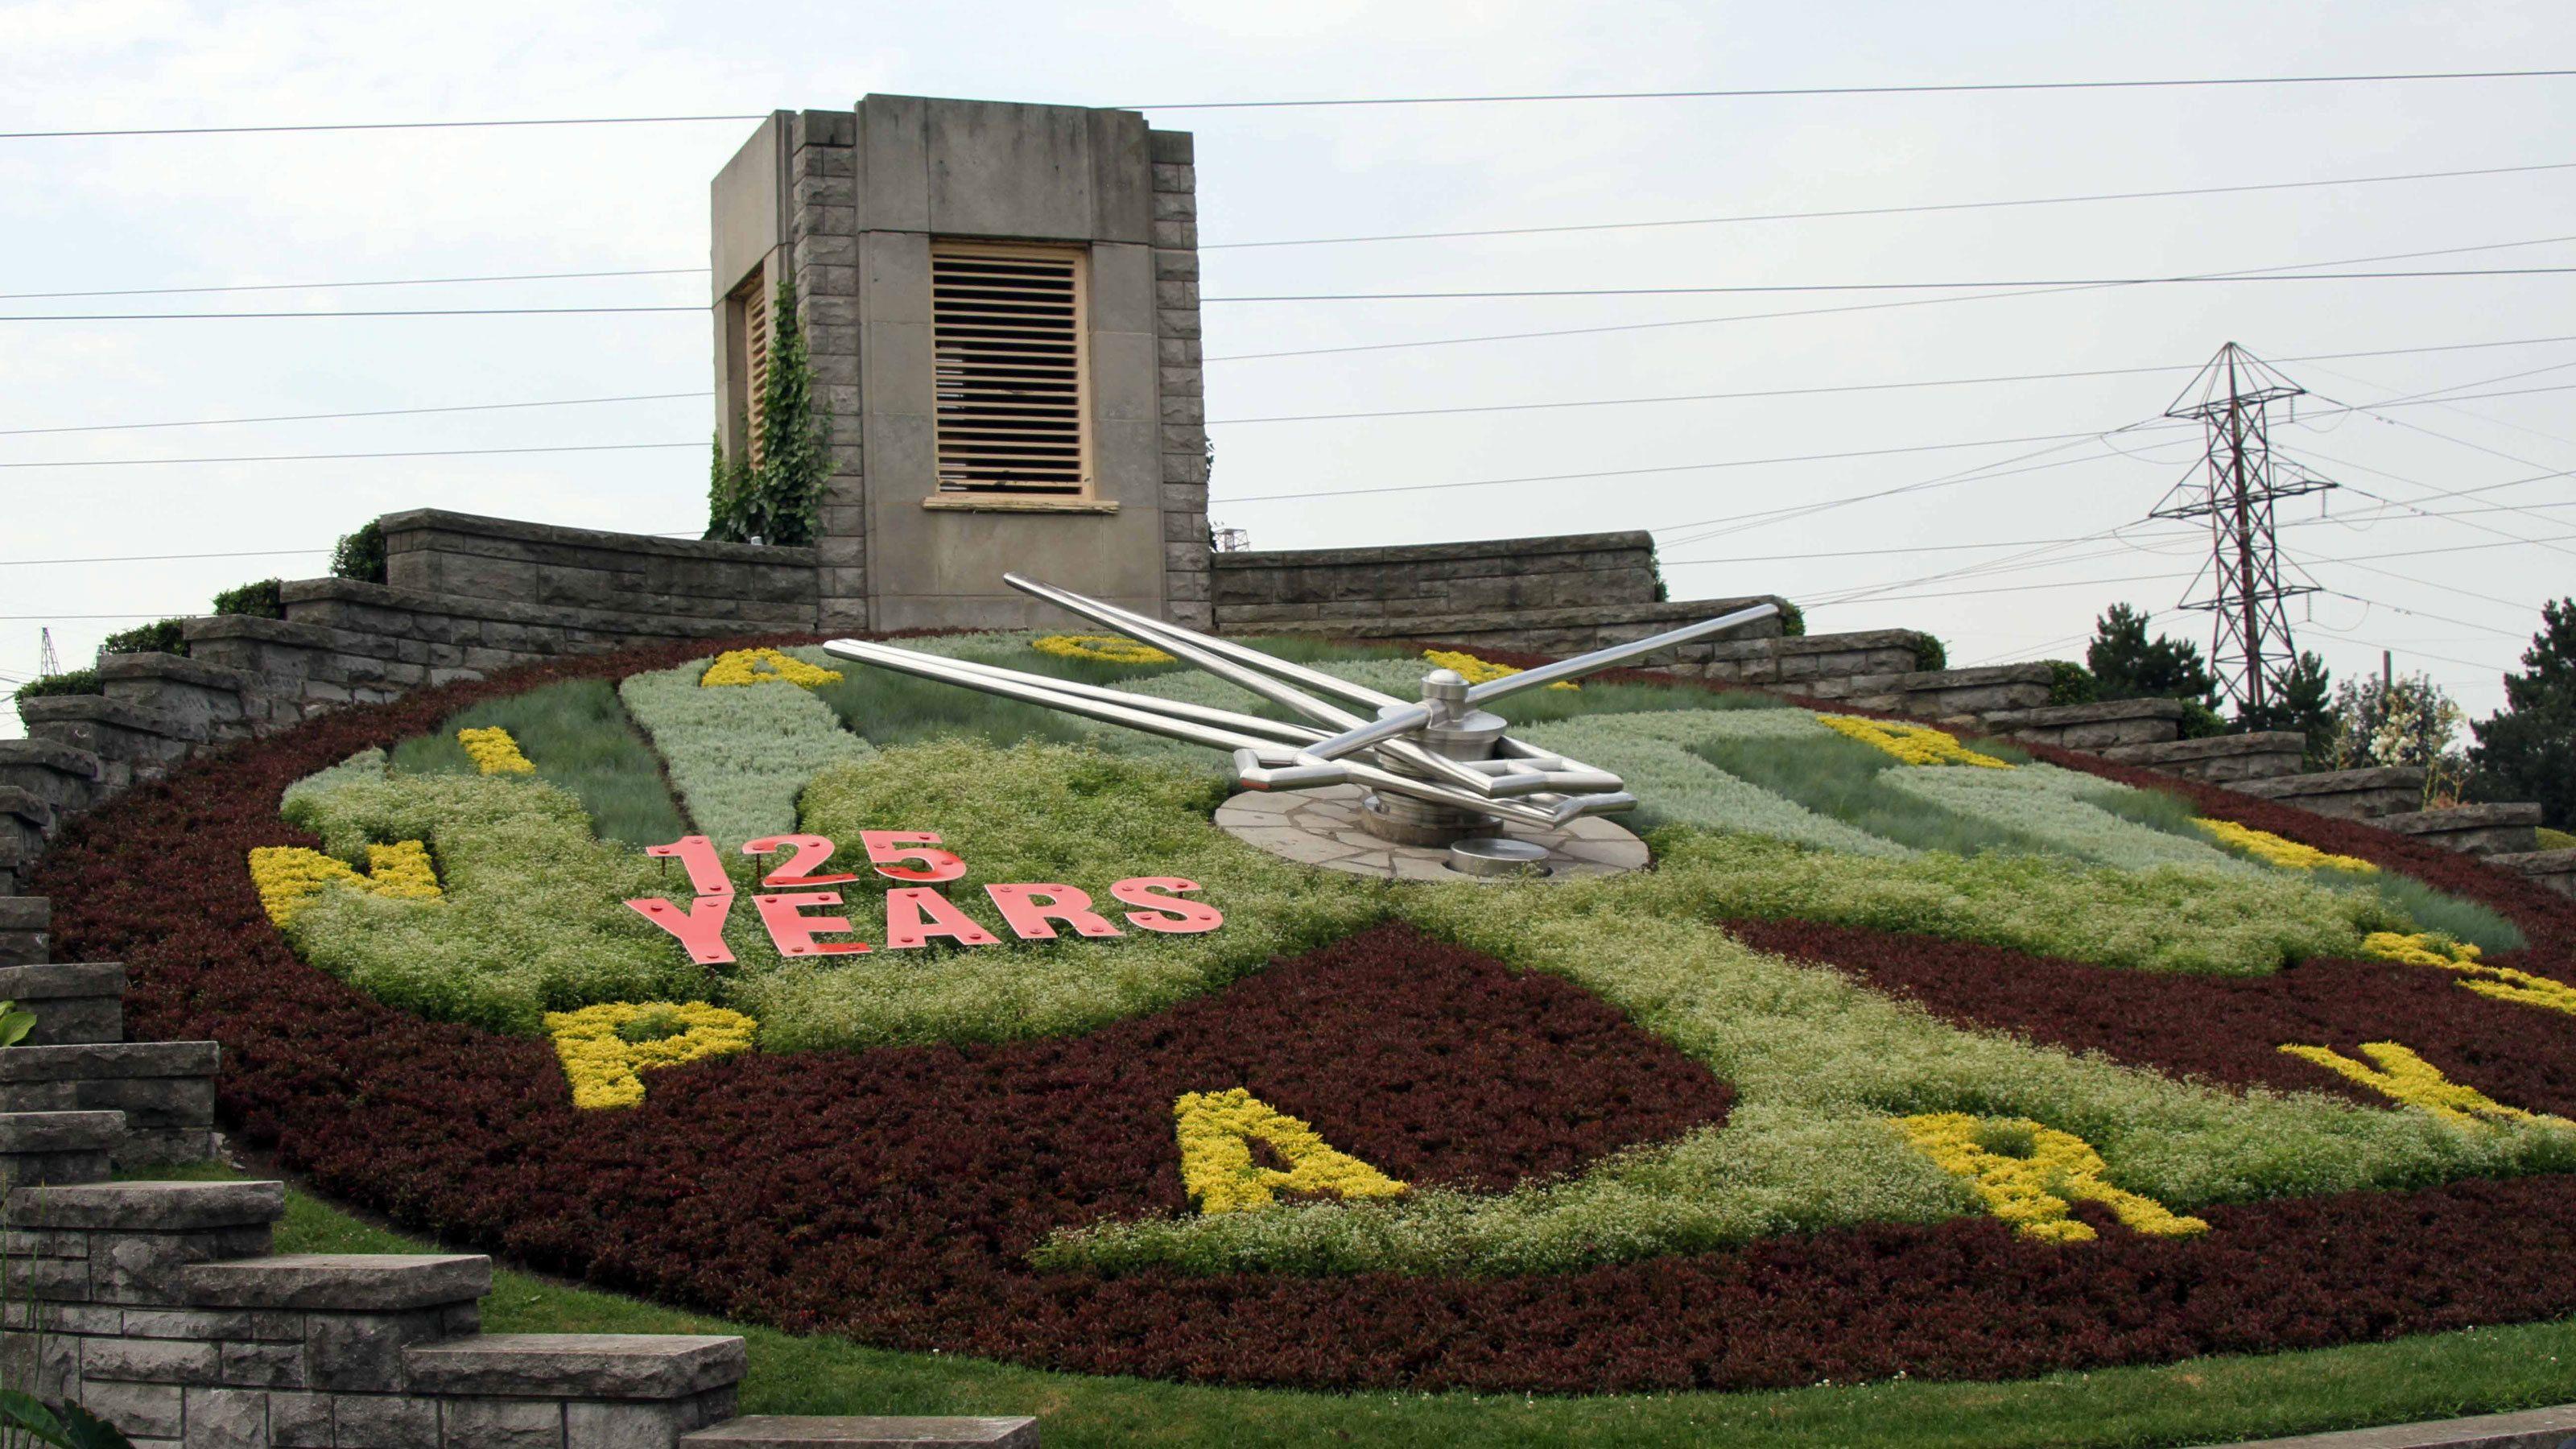 The Floral Clock at Niagara Park in Ontario